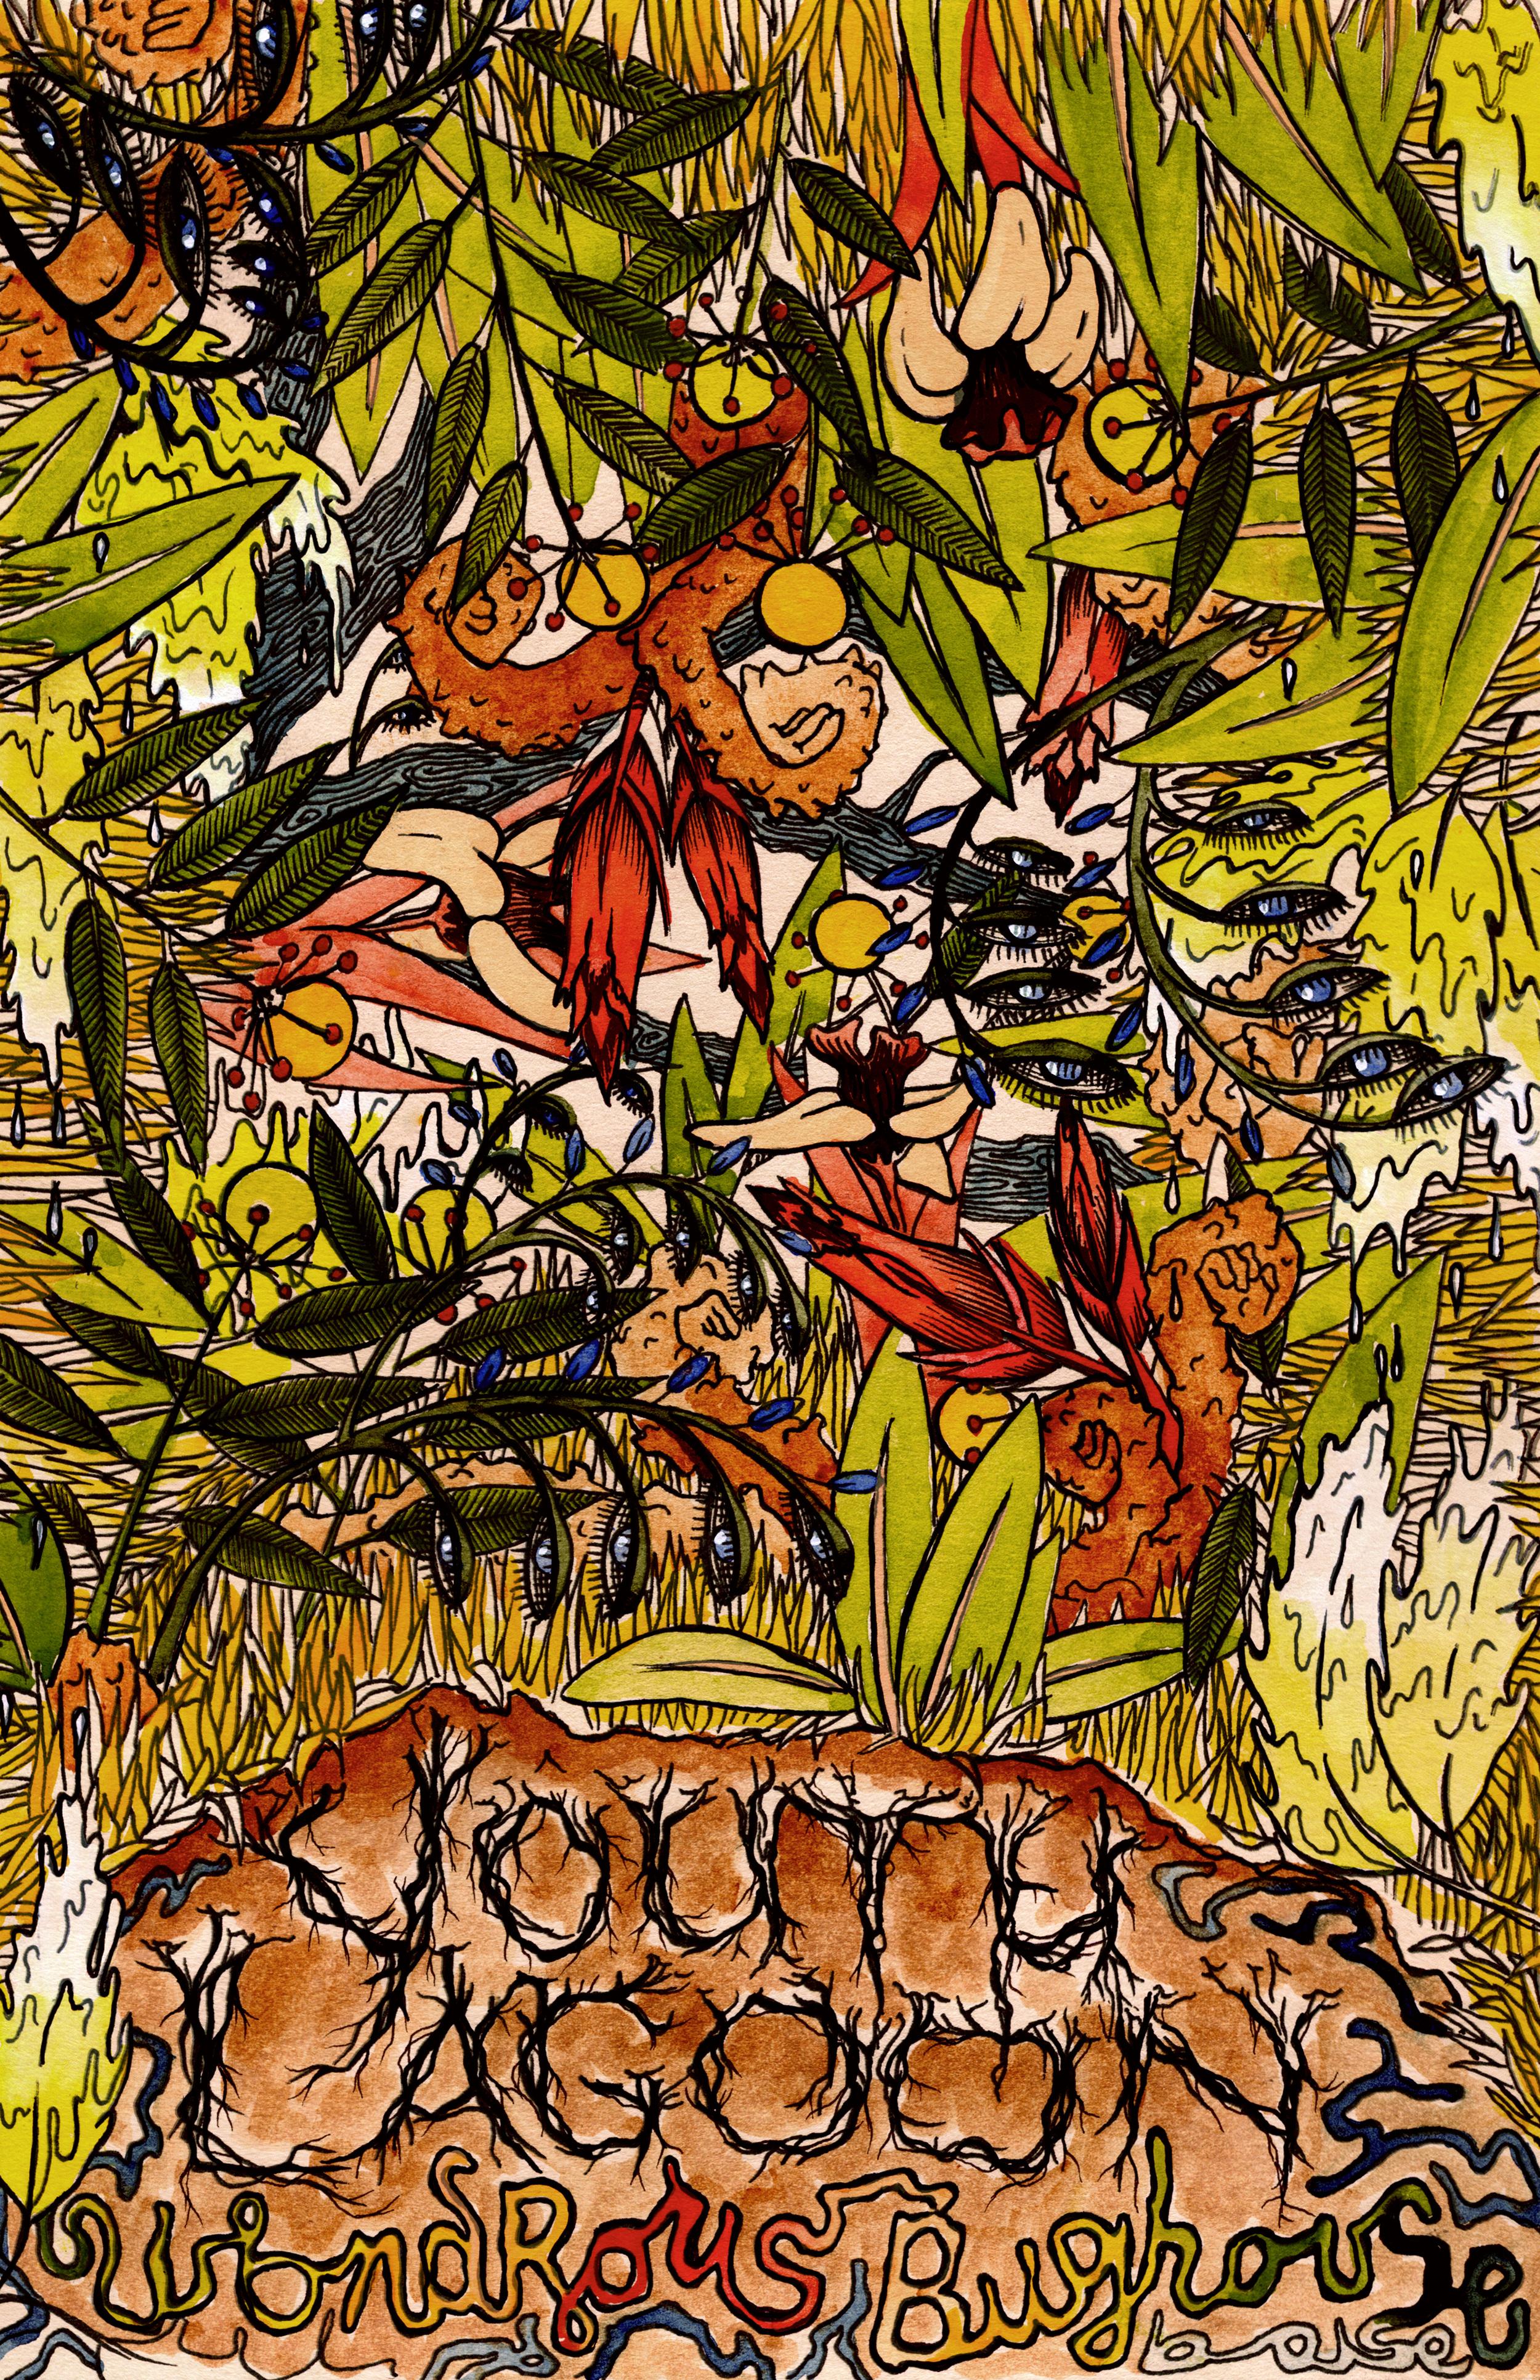 Youth Lagoon, Wondrous Bughouse